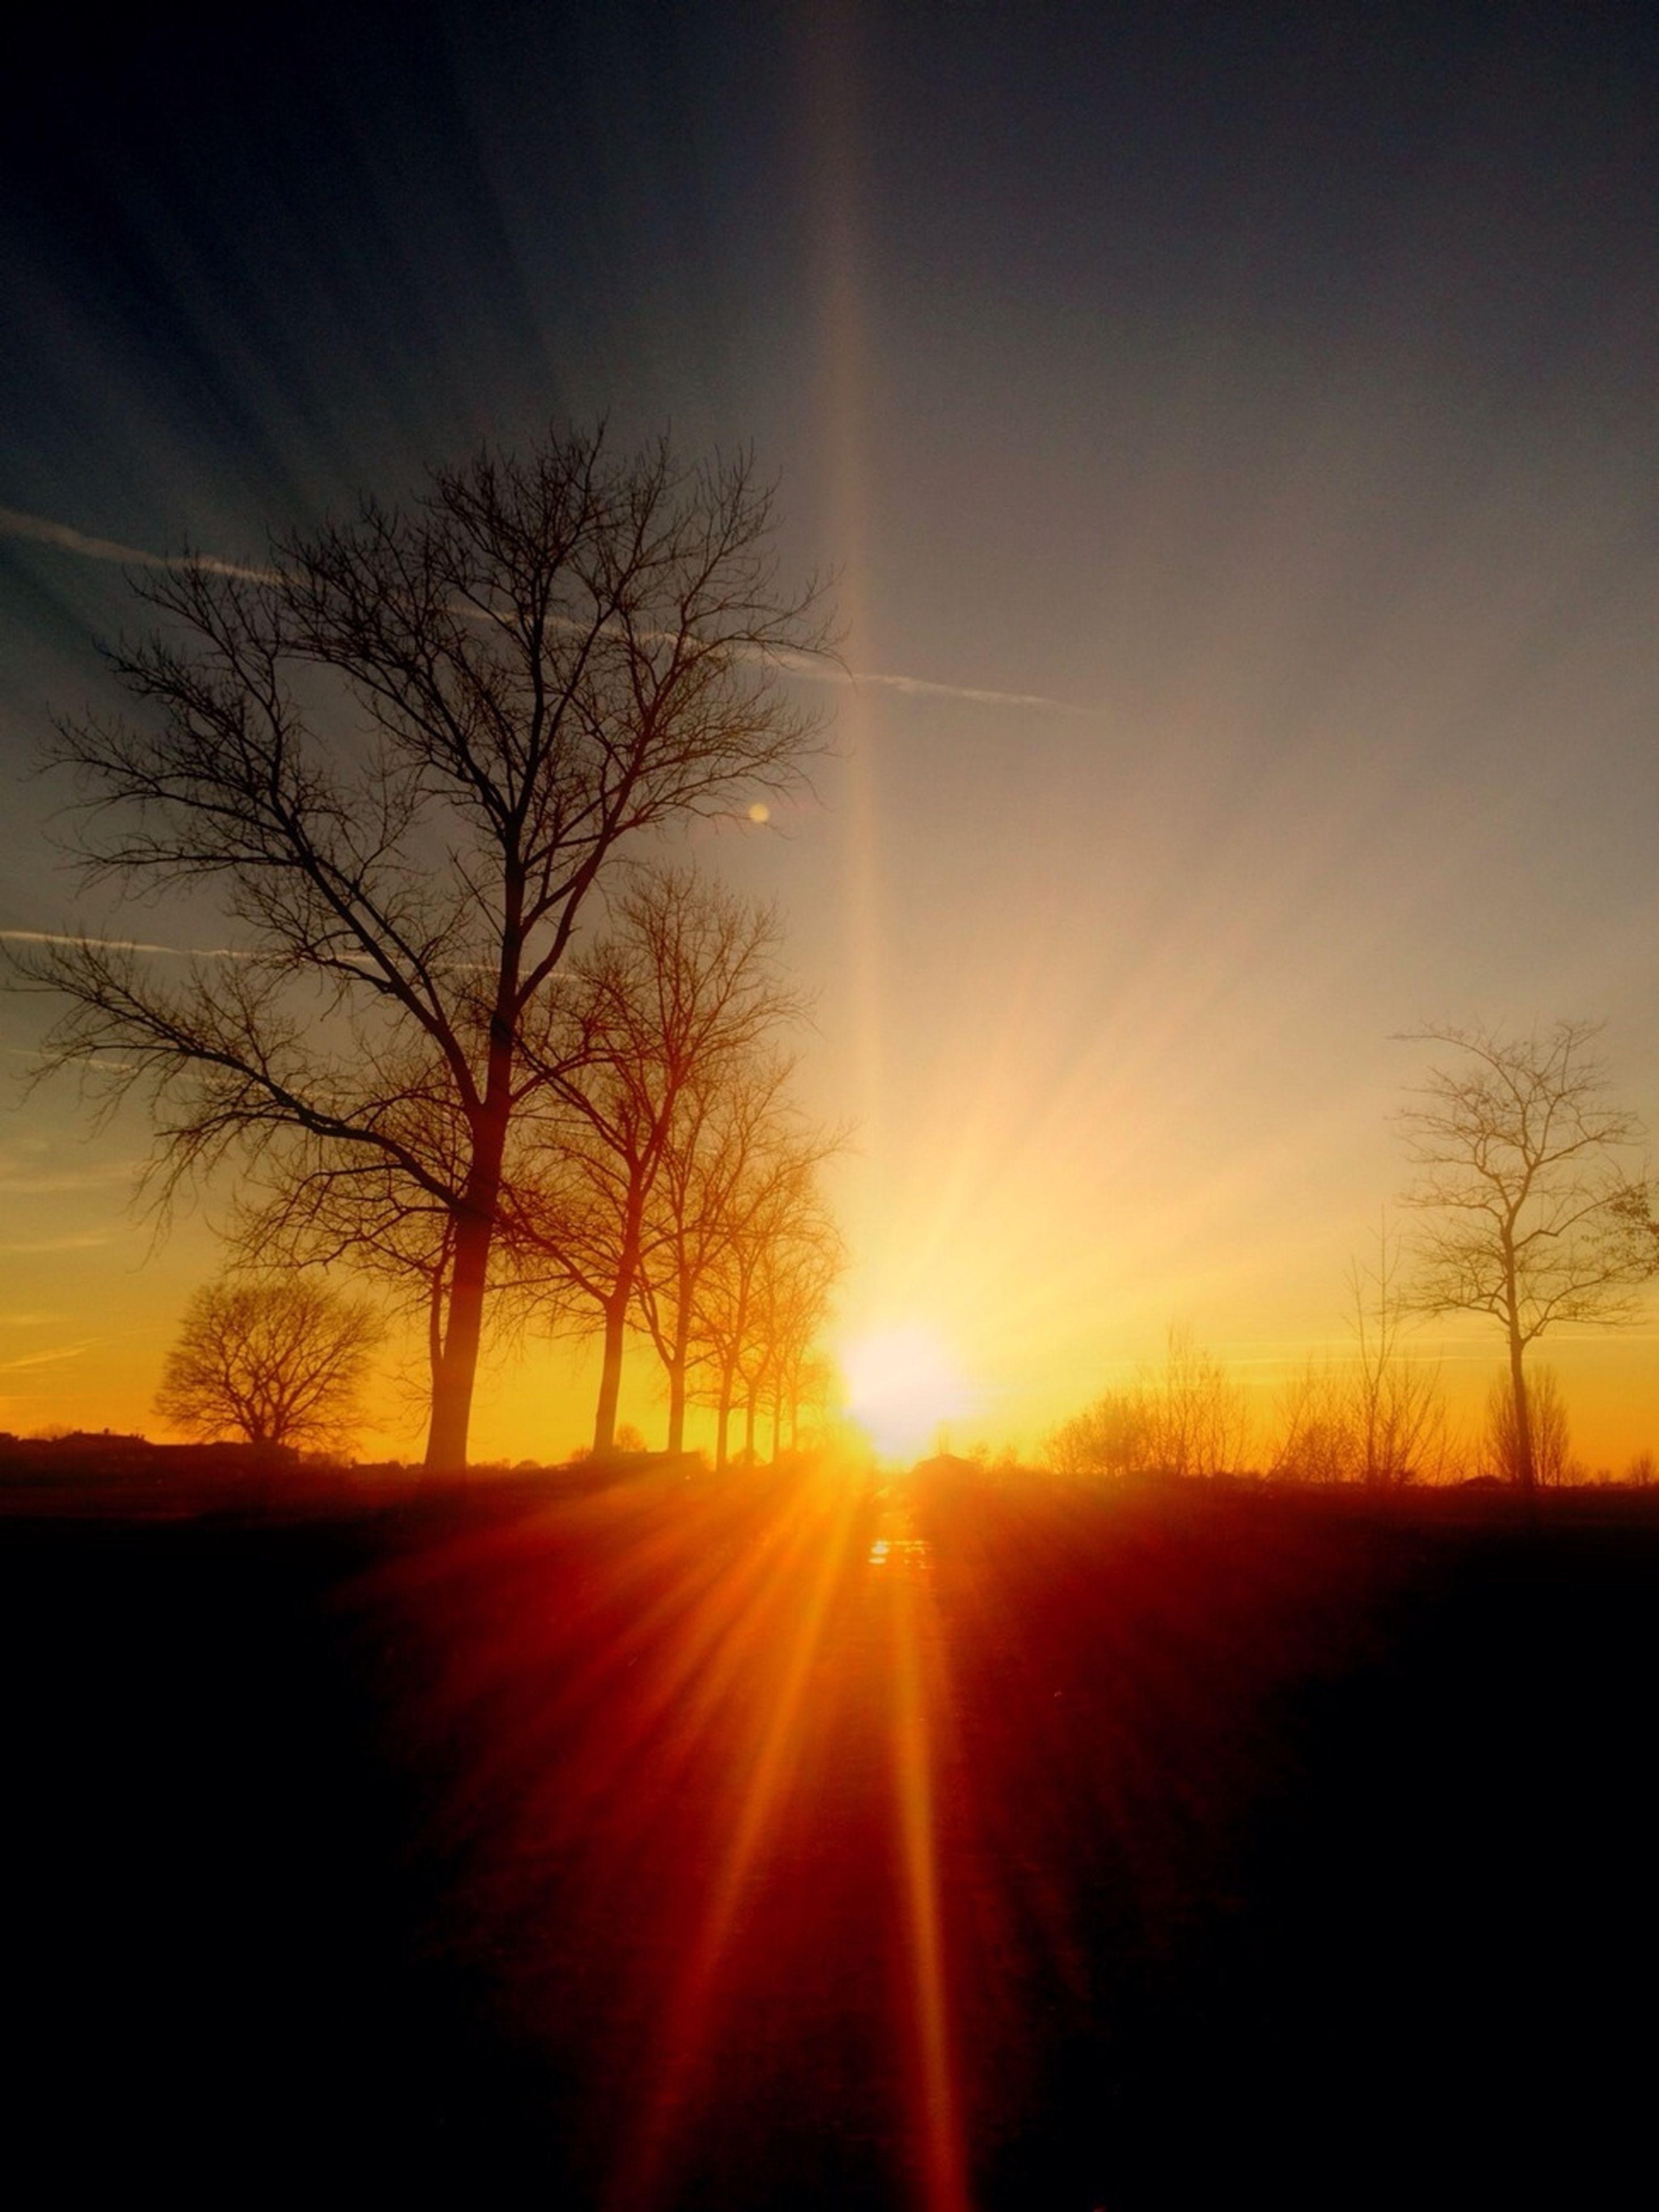 sunset, sun, silhouette, bare tree, tranquility, tranquil scene, scenics, orange color, tree, beauty in nature, sky, landscape, sunlight, nature, idyllic, sunbeam, field, lens flare, branch, back lit